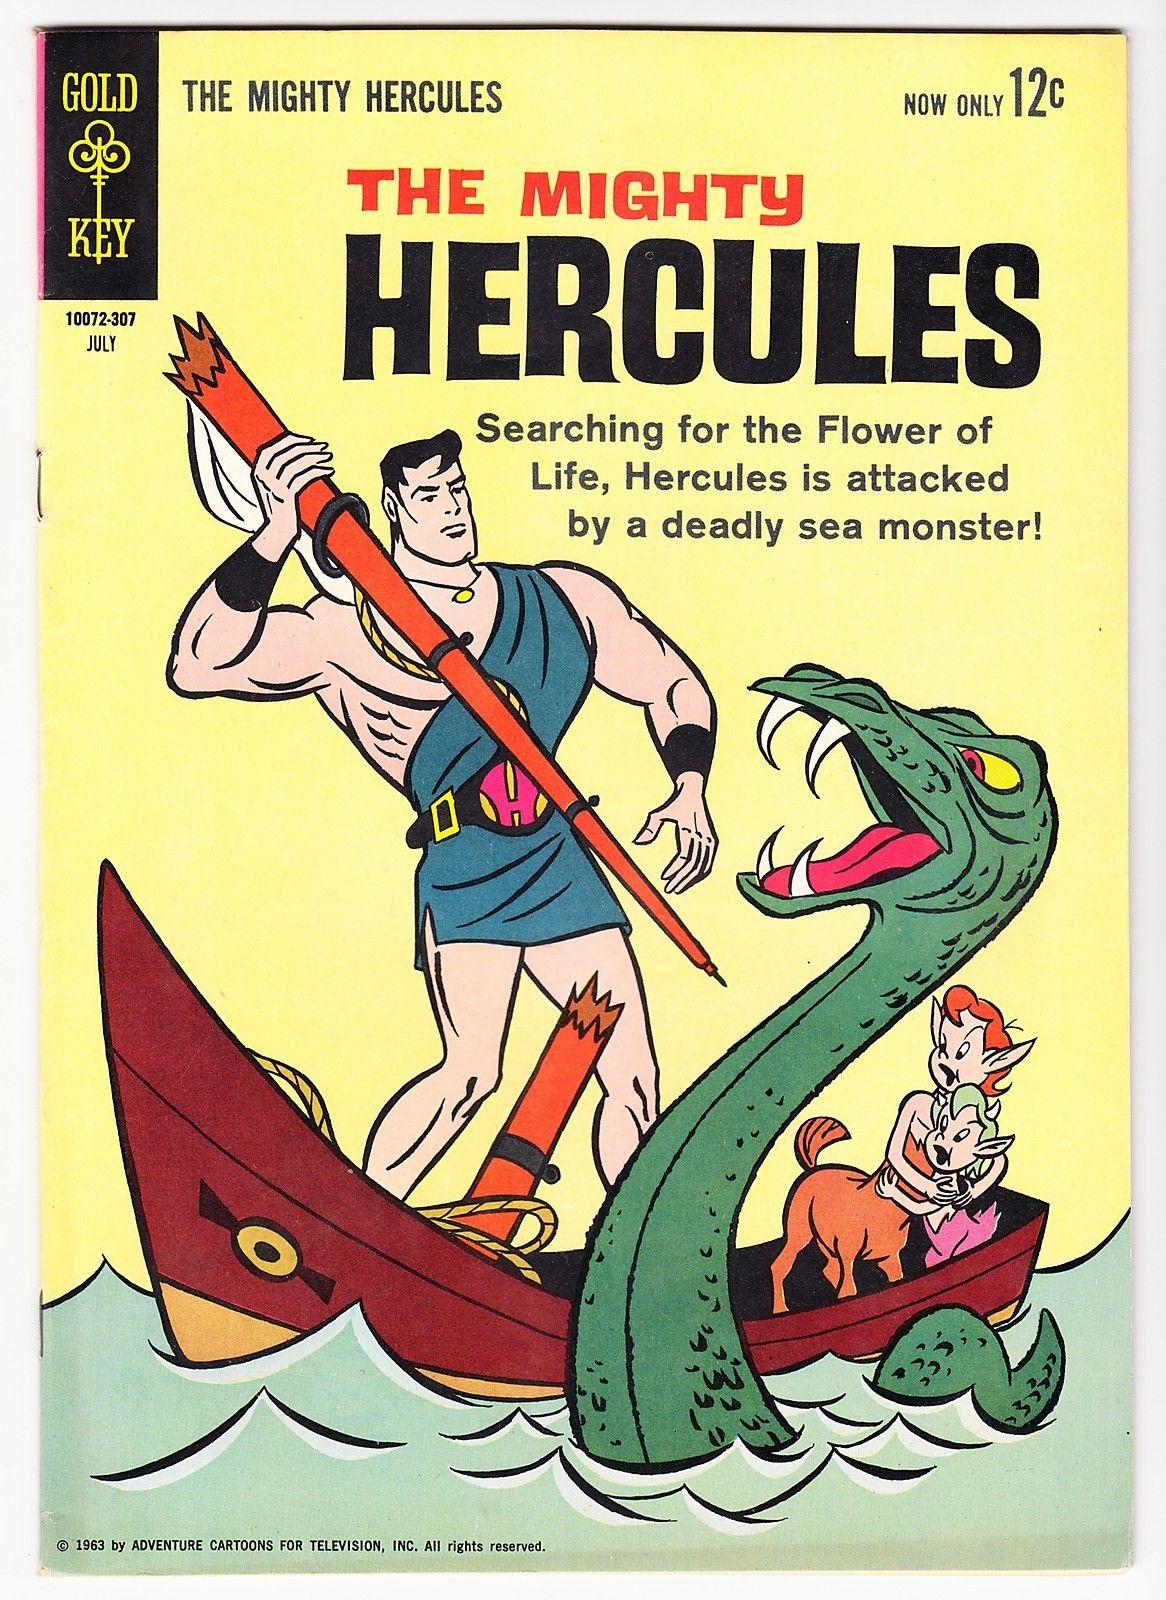 O PODEROSO HÉRCULES (THE MIGHTY HERCULES)